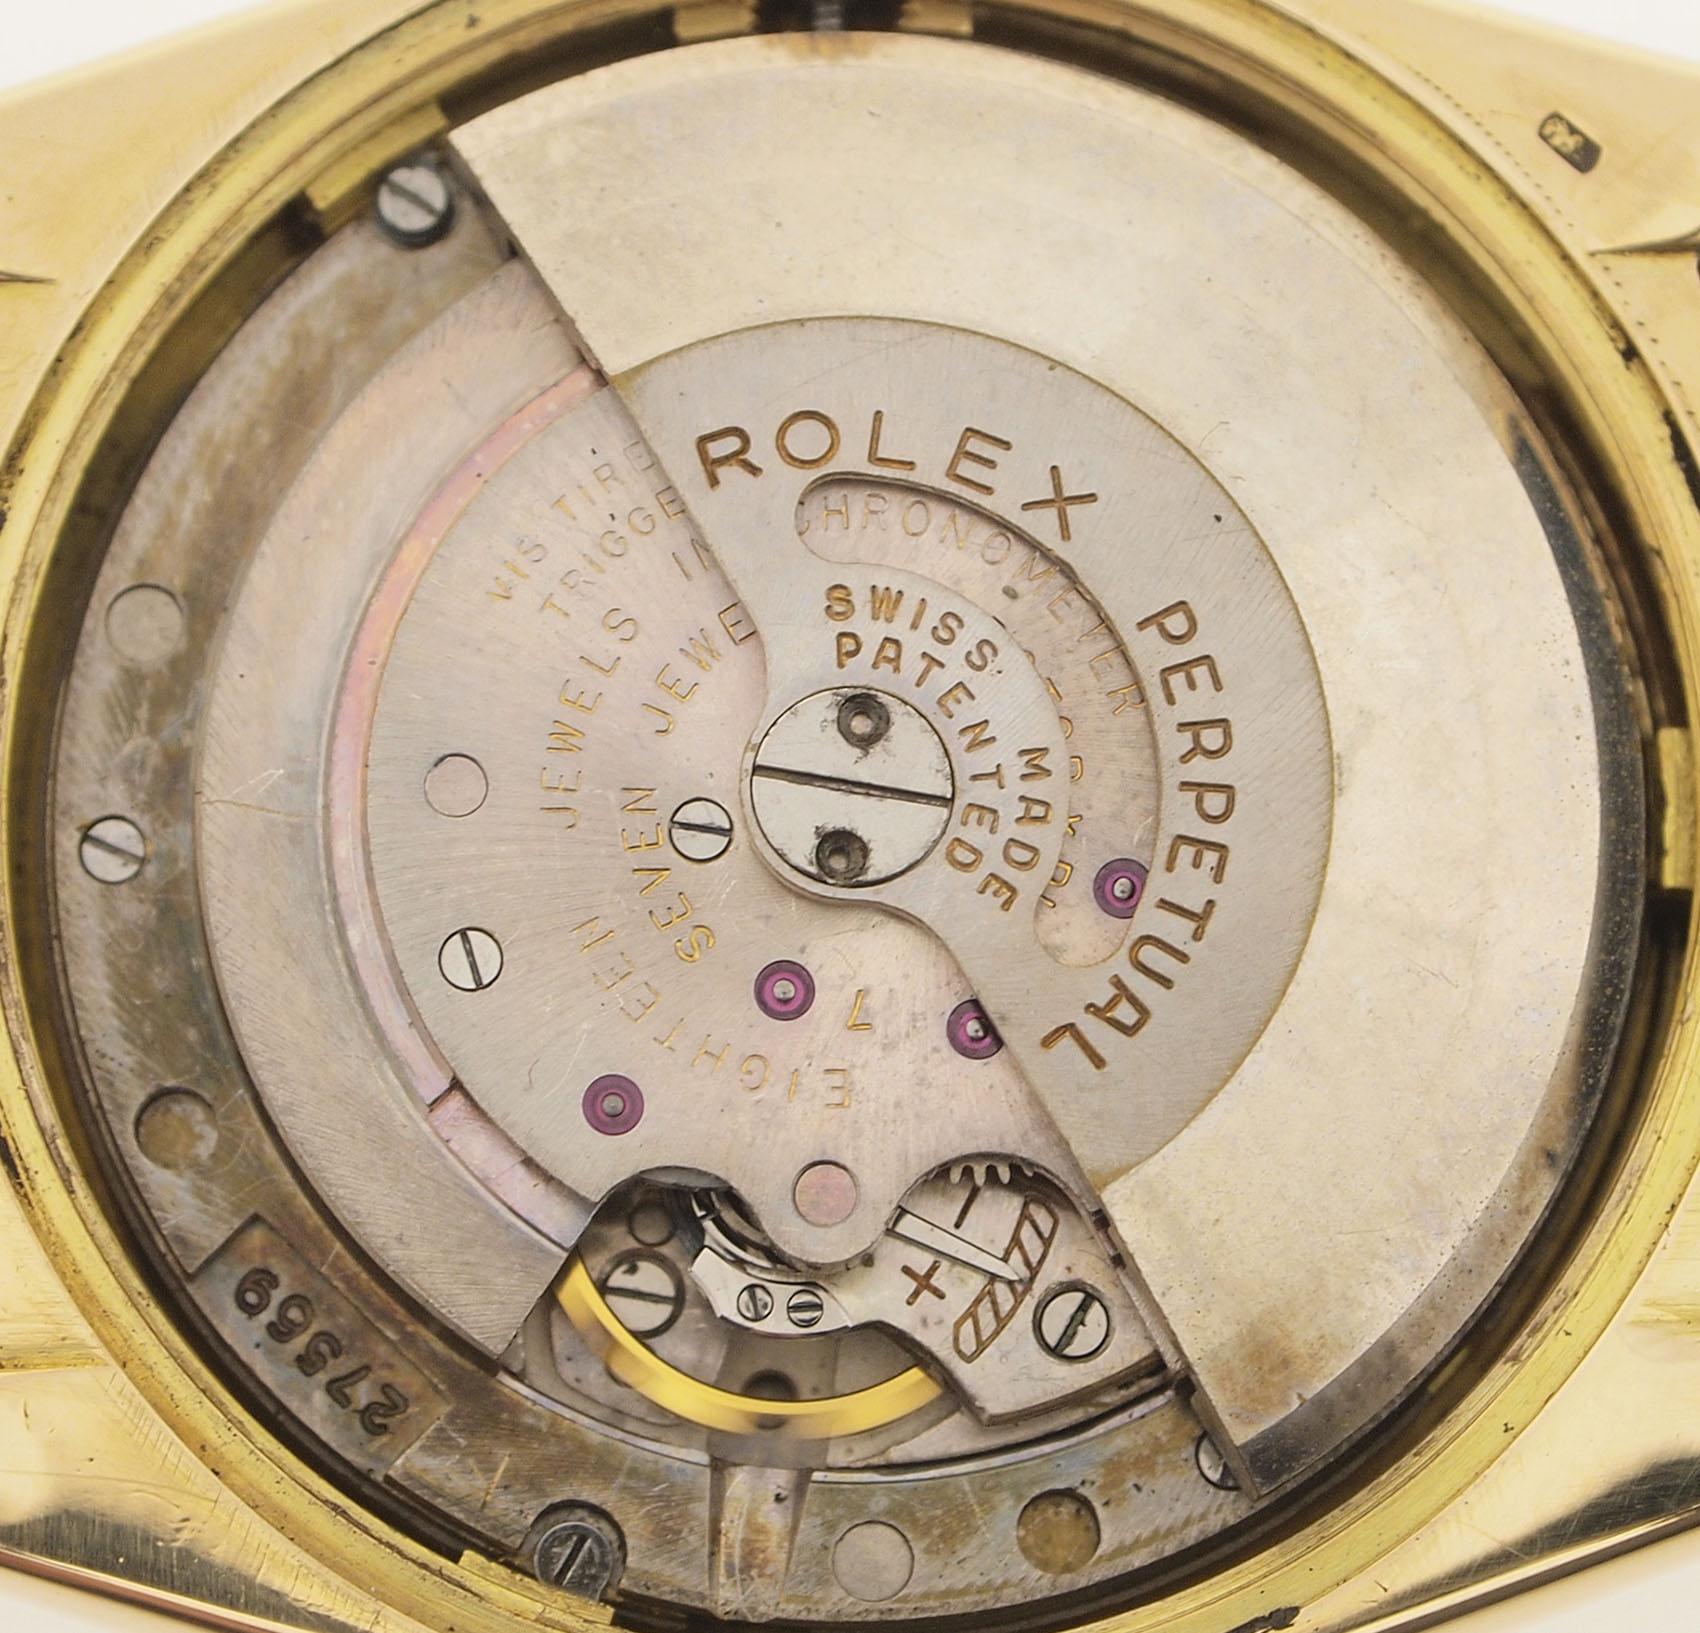 rolex big bubble ref 6105 oyster perpetual datejust chronometer 18ct gold ebay. Black Bedroom Furniture Sets. Home Design Ideas